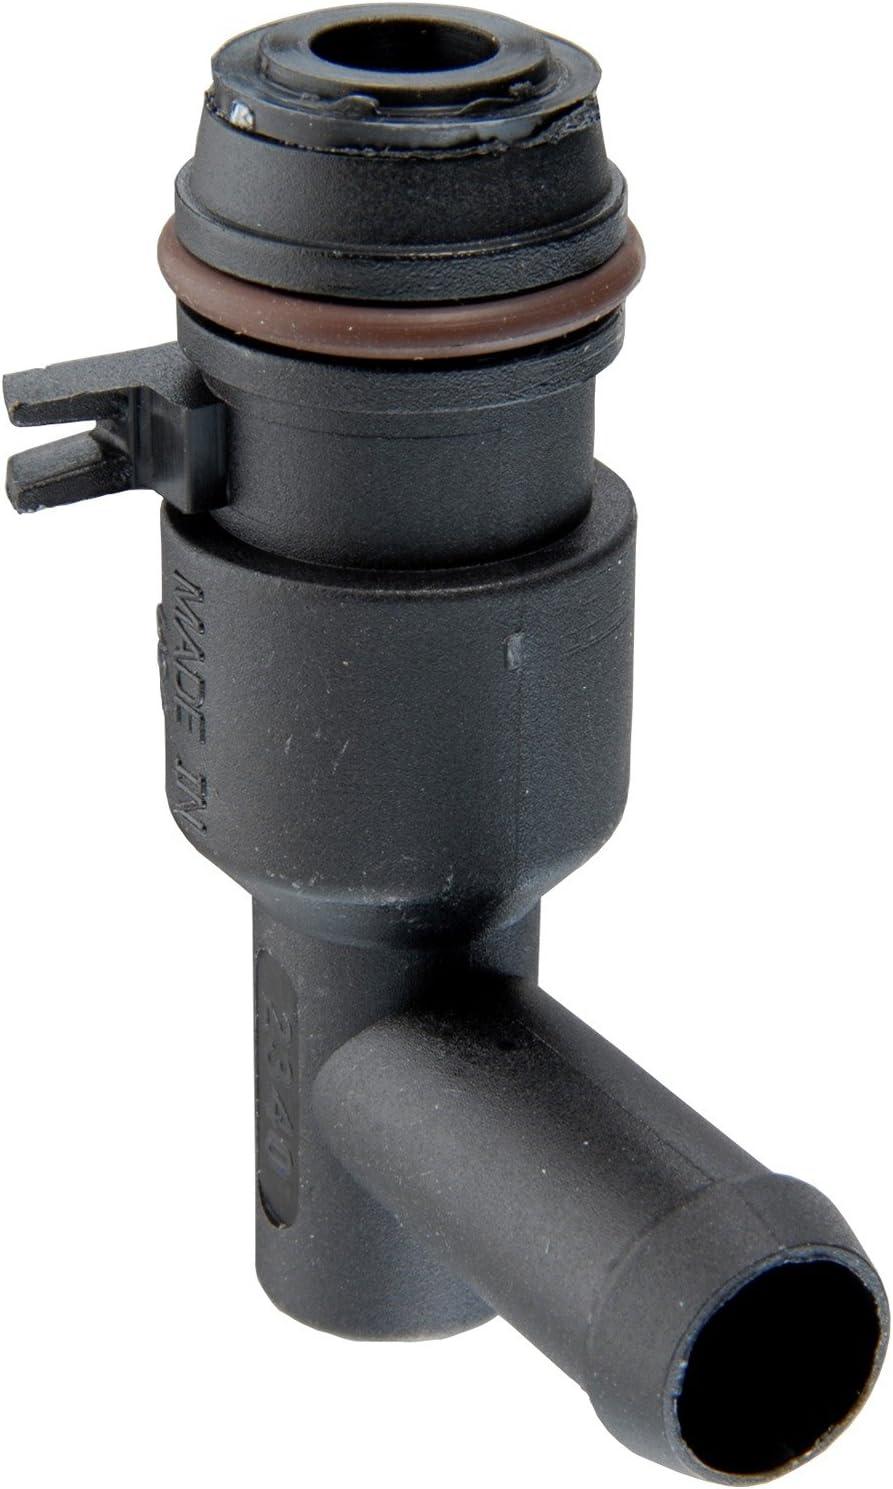 Engine Crankcase Breather Element-CRANKCASE VENTILATION FILTER Standard BF38